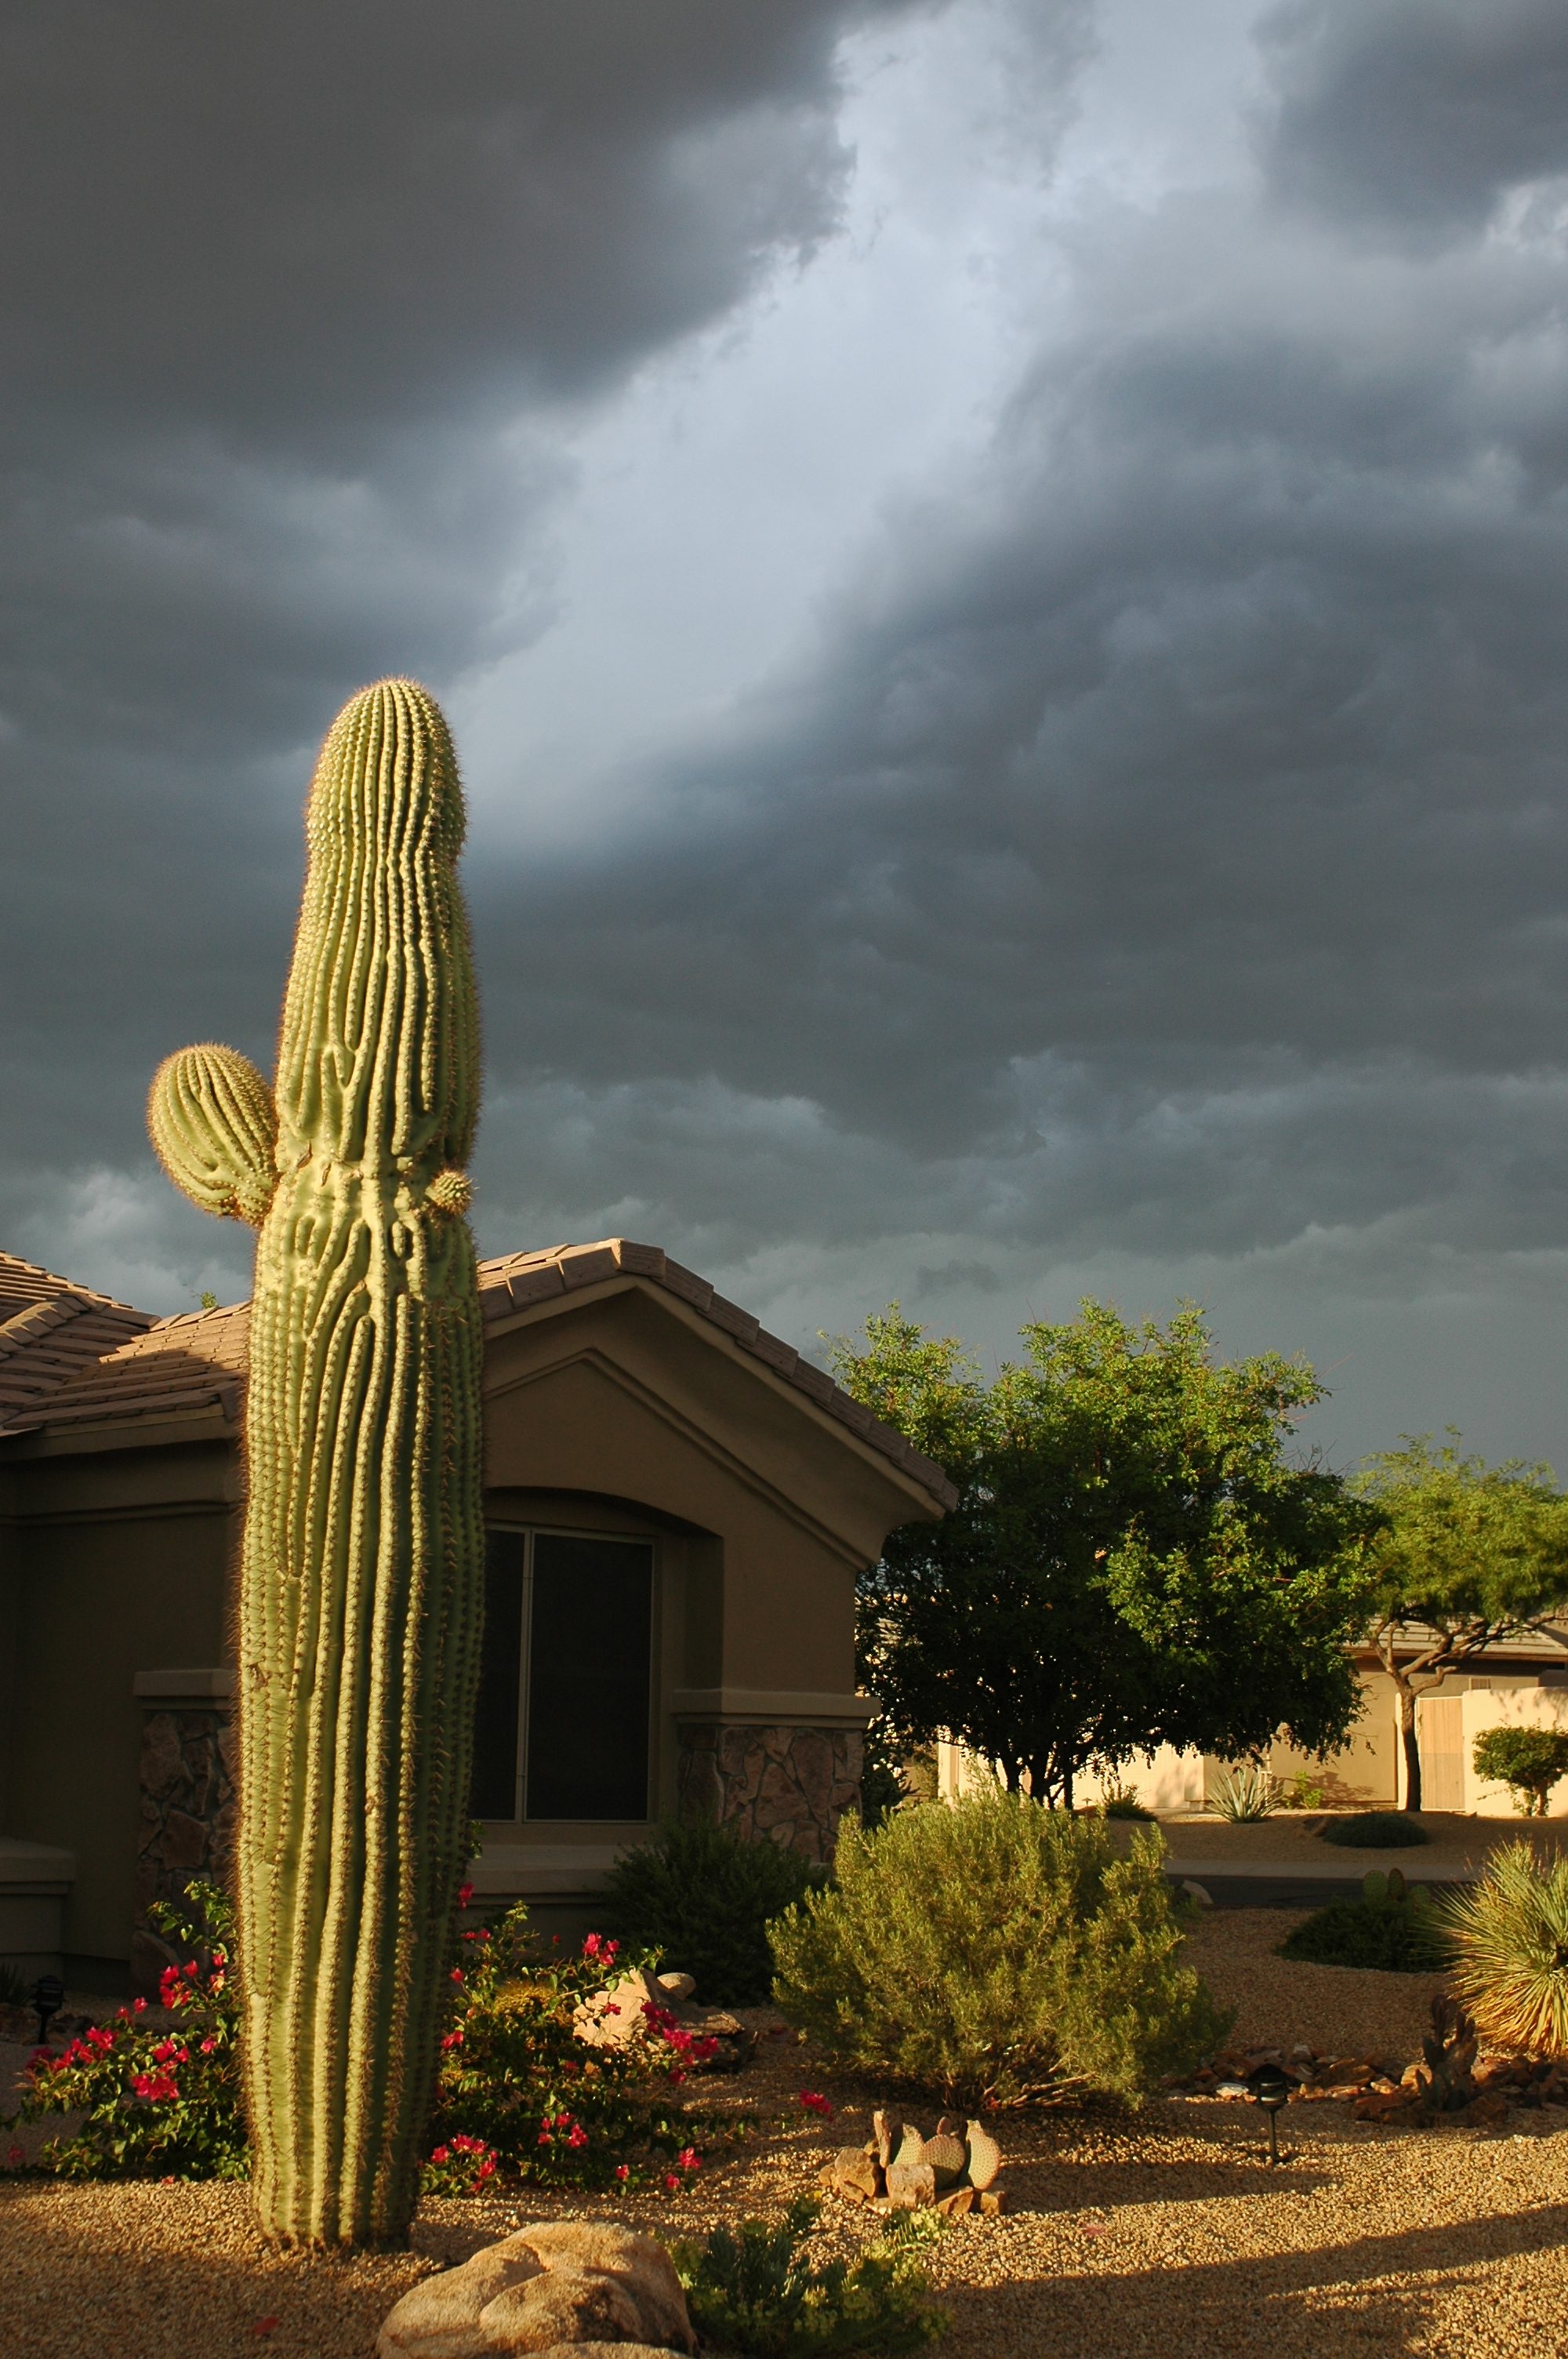 Joe Dobrow photo of an illuminated cactus